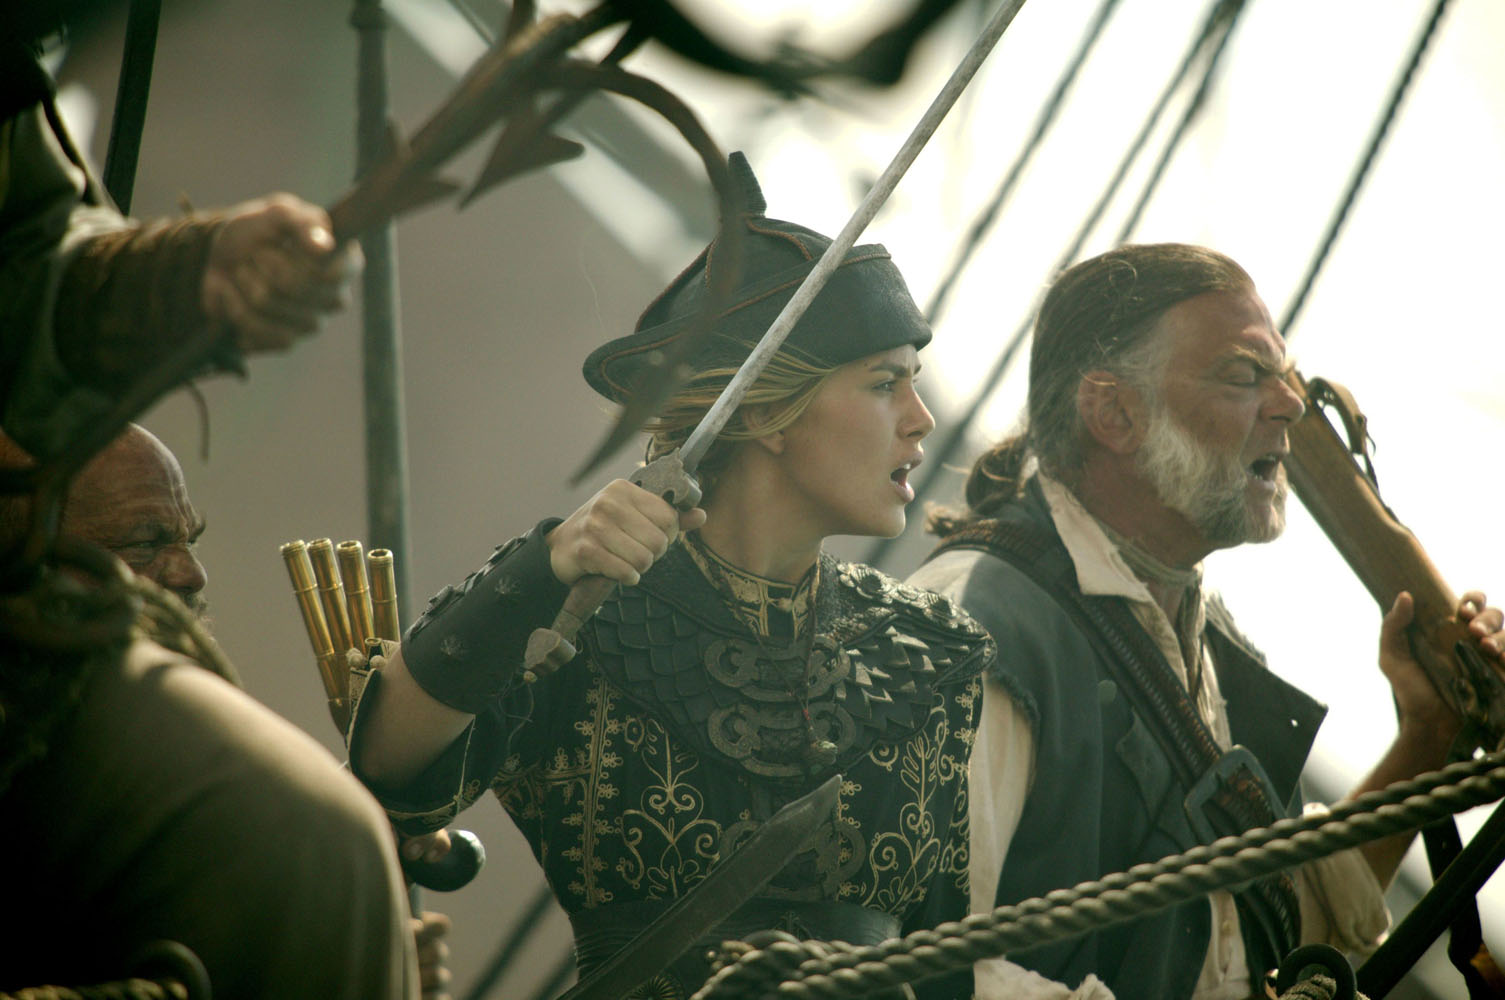 кадры из фильма Пираты Карибского моря: На краю света Кевин МакНэлли, Кира Найтли,